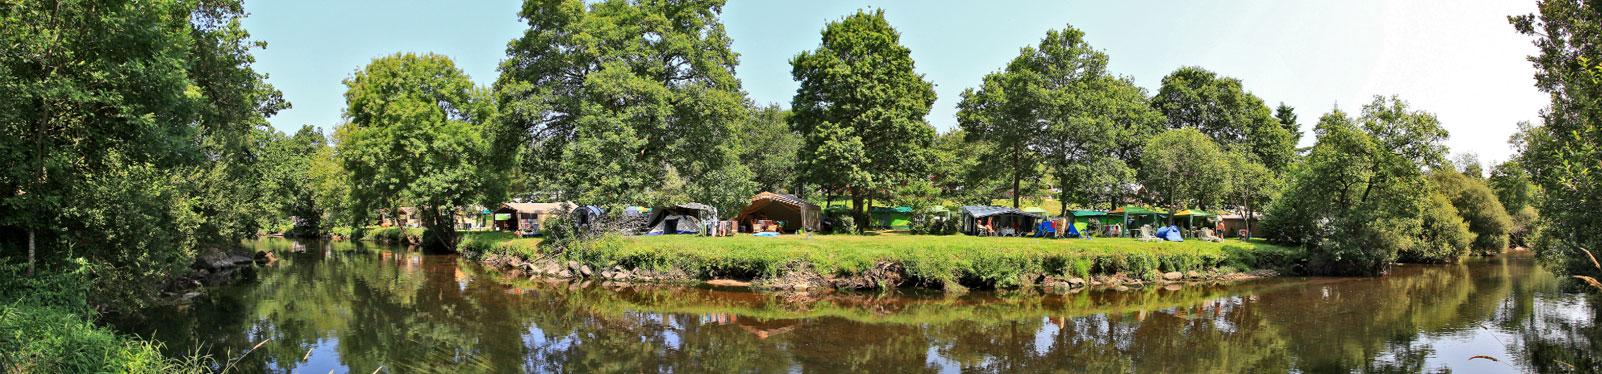 Camping Le Ty Nadan